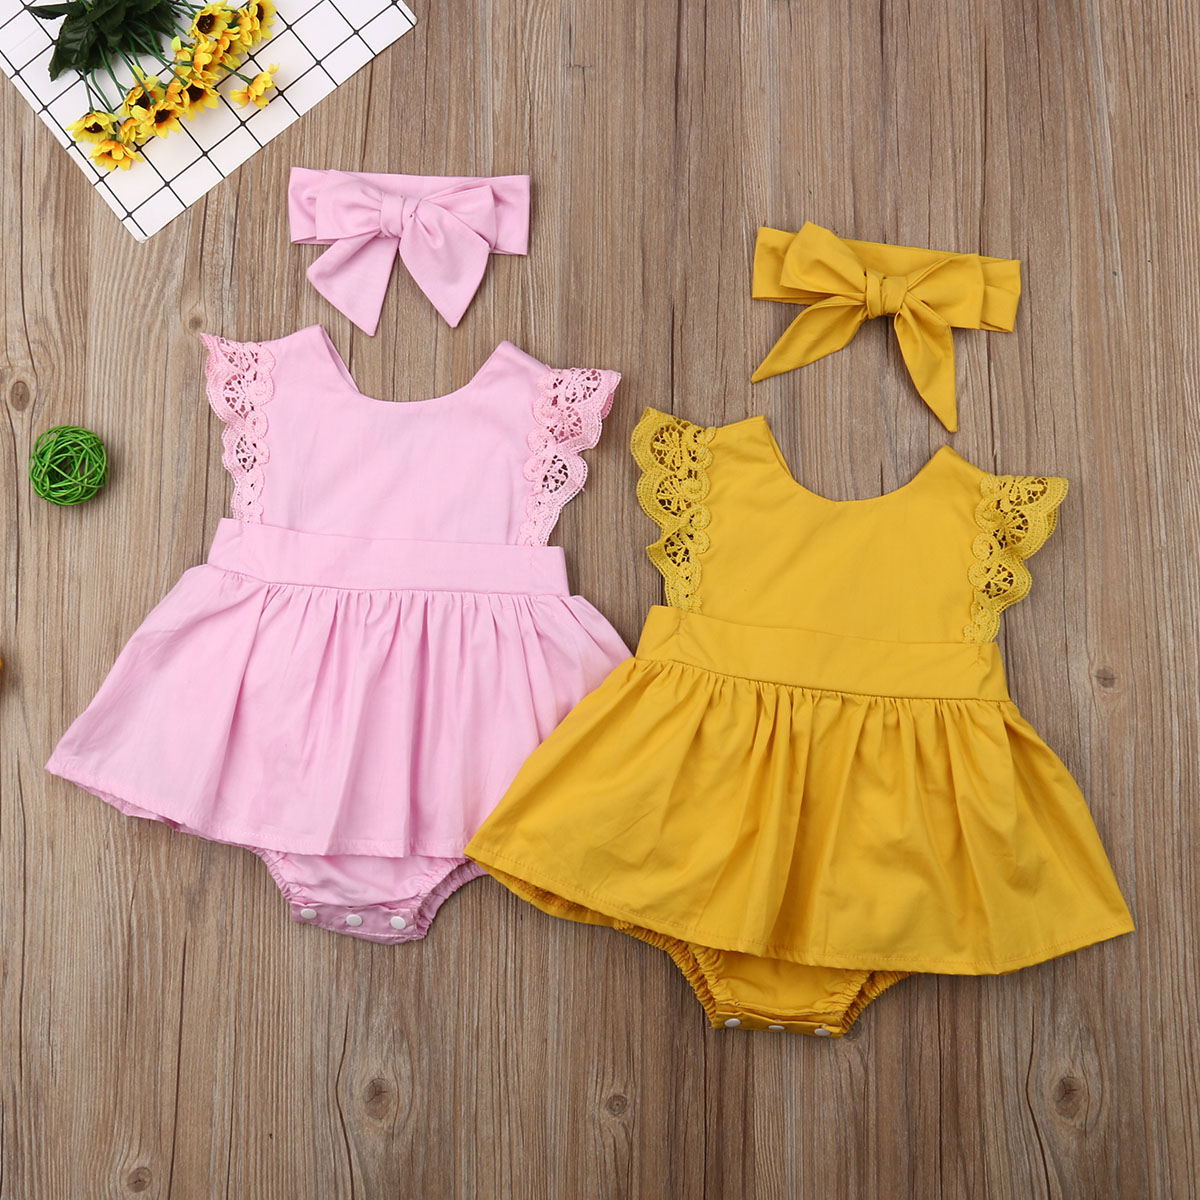 Newborn Infant Baby Girl Kids Solid Bow Romper Top Bodysuit Jumpsuit Outfit Set